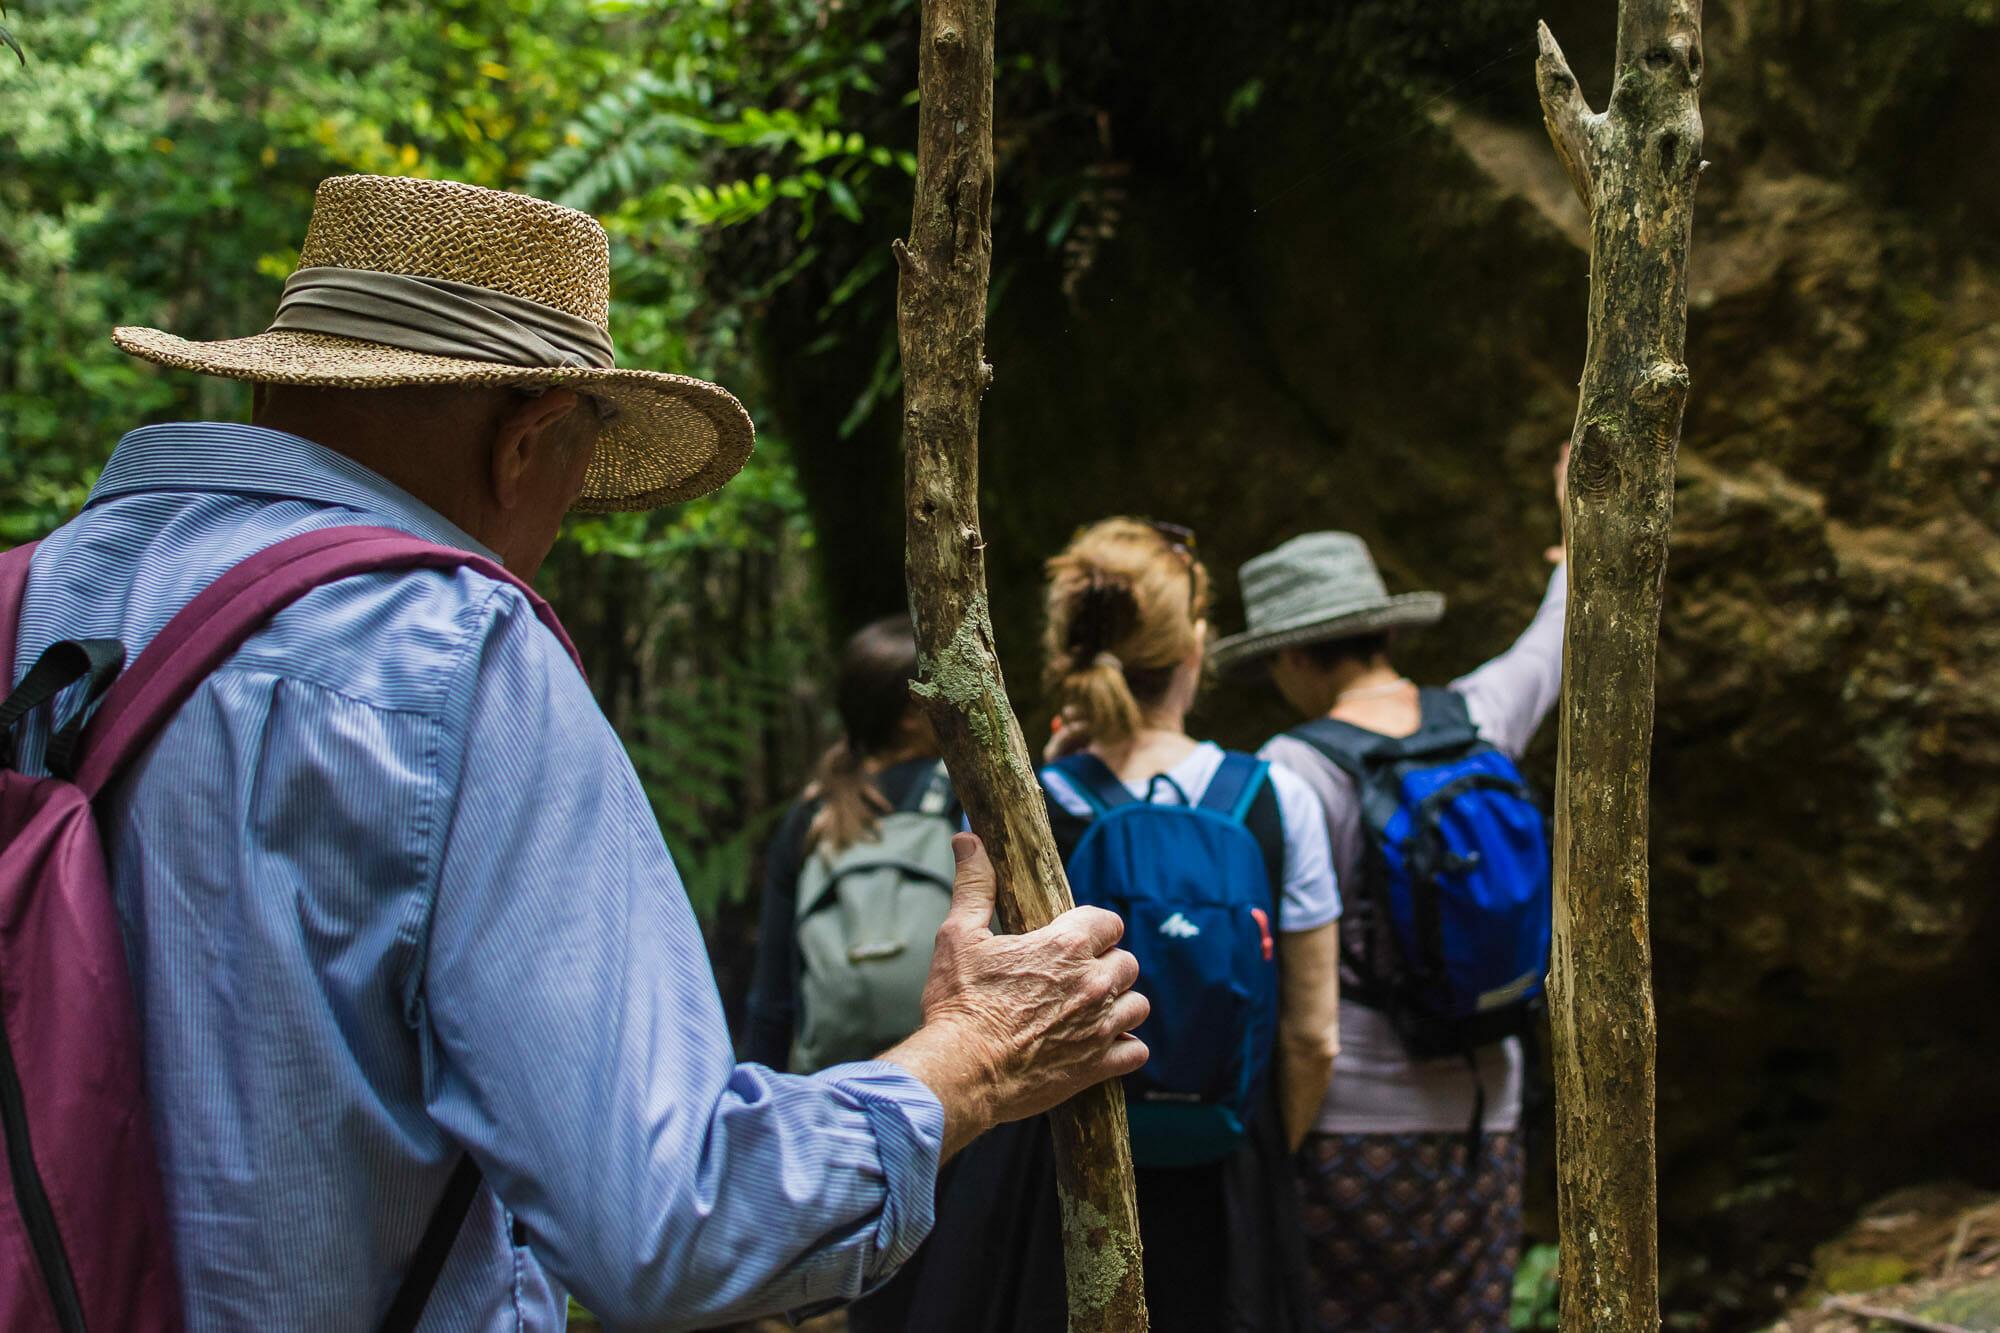 Mt Wellington, Guided, guide, walk, tour, hobart Tasmania, kunanyi, moutain gems, half day, walking tour,